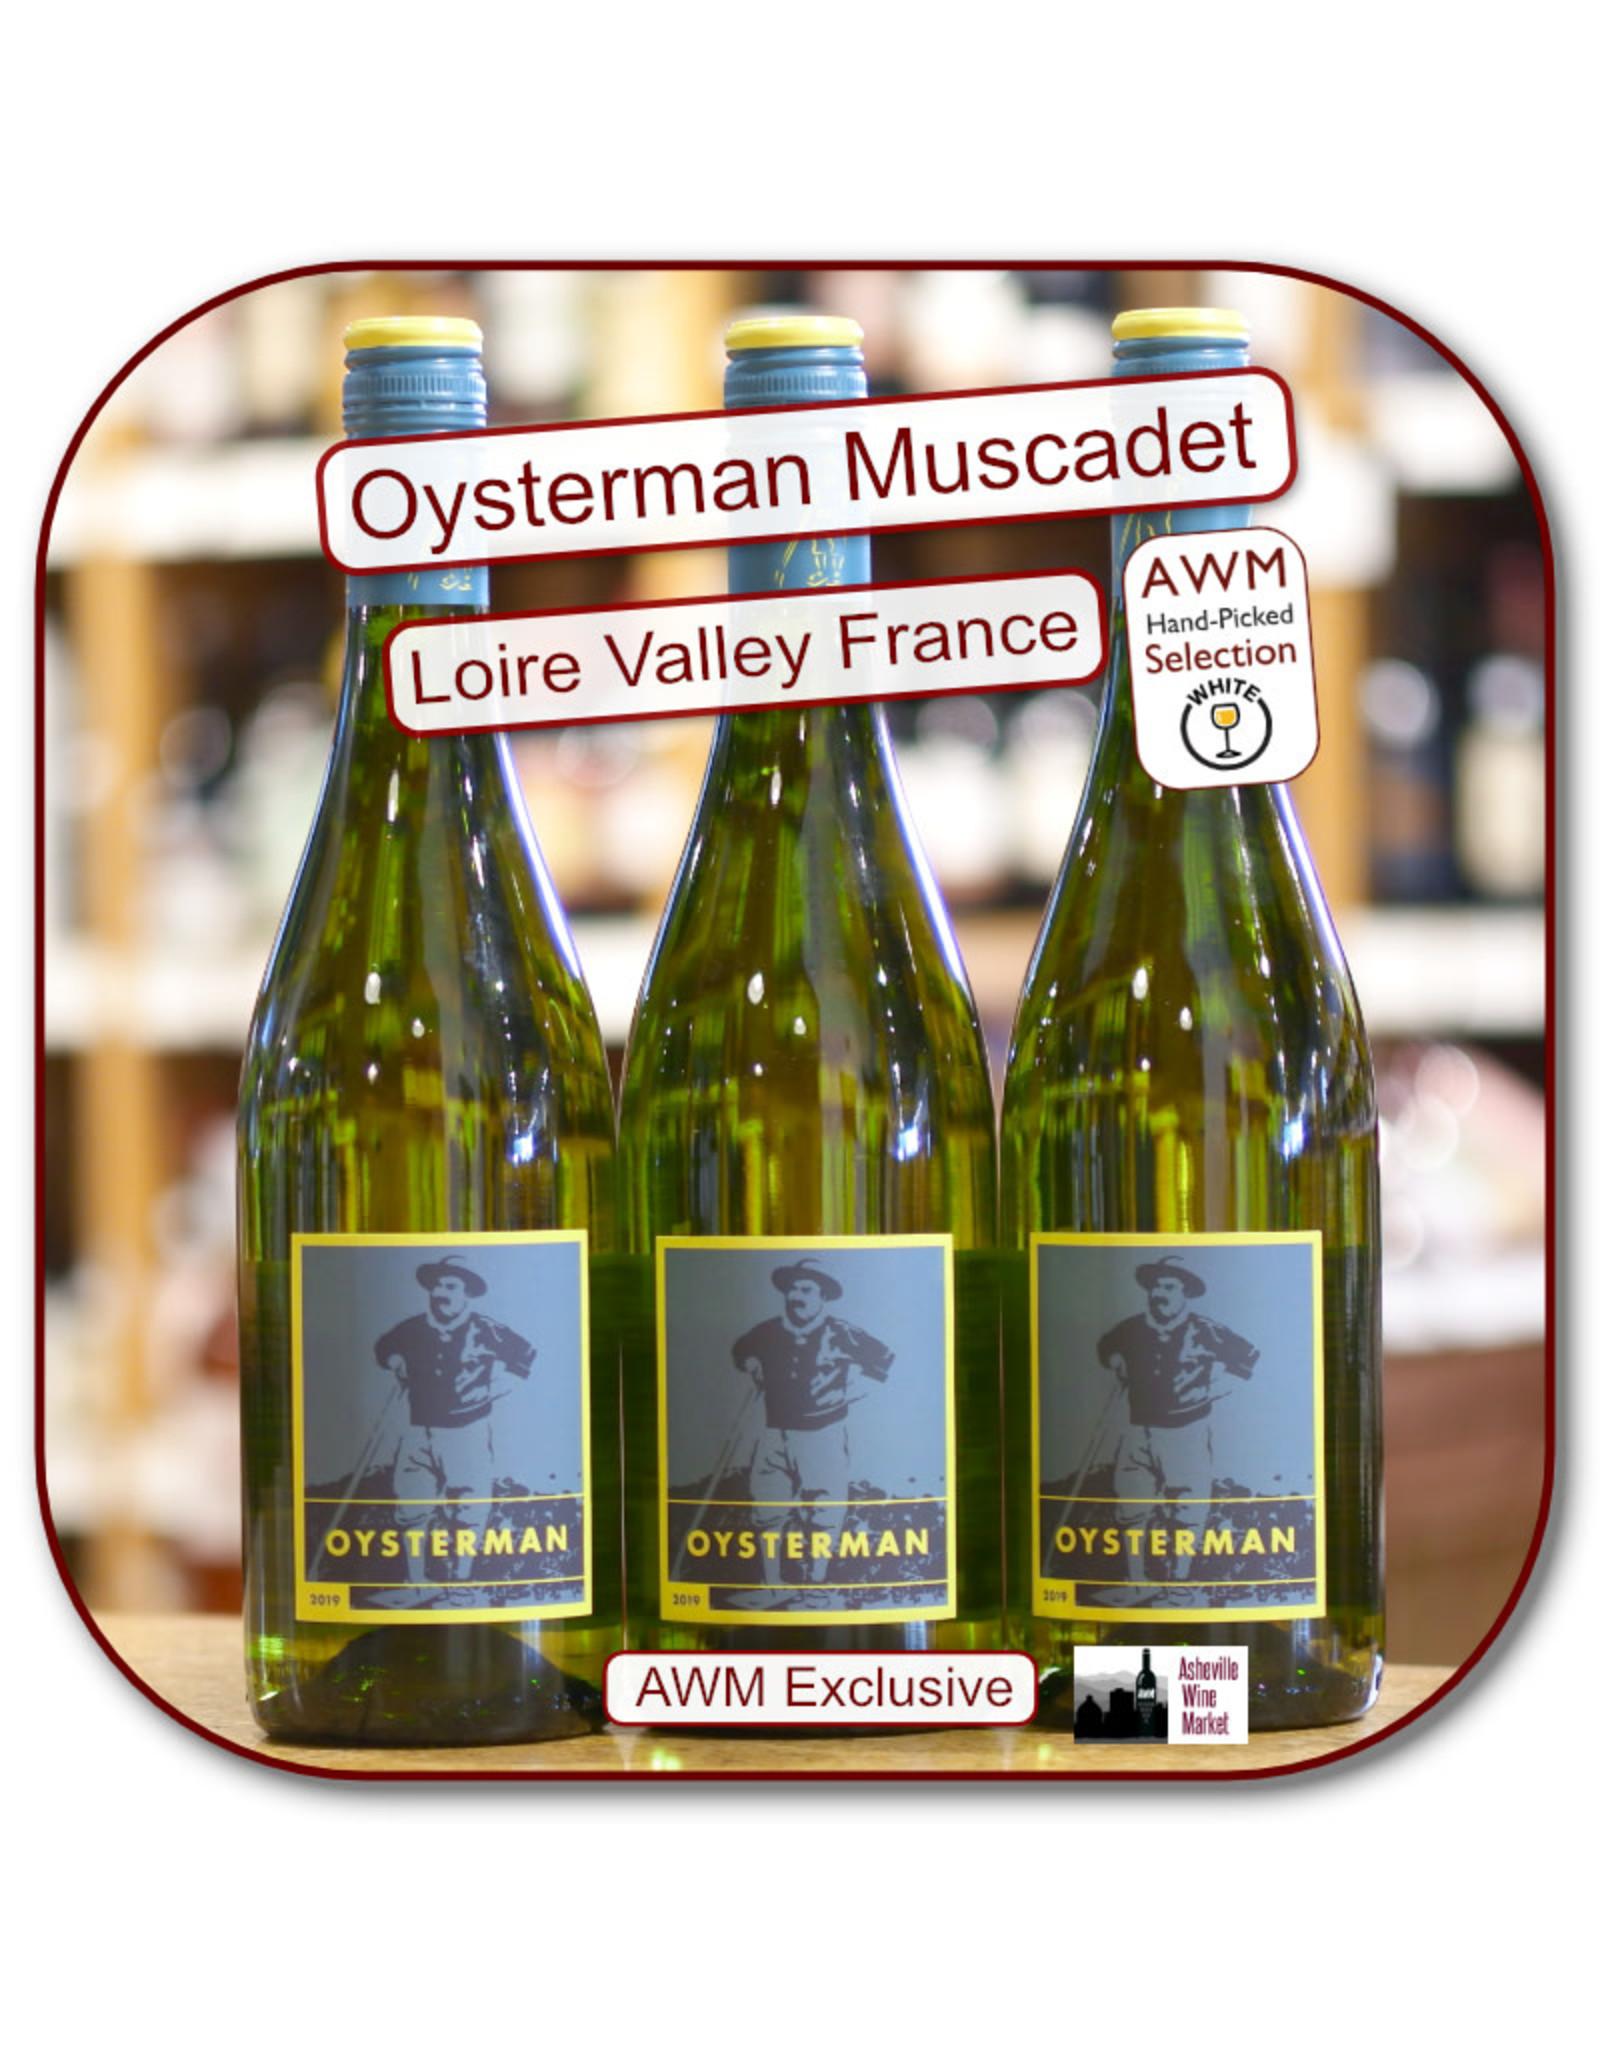 Muscadet Oysterman Muscadet 19